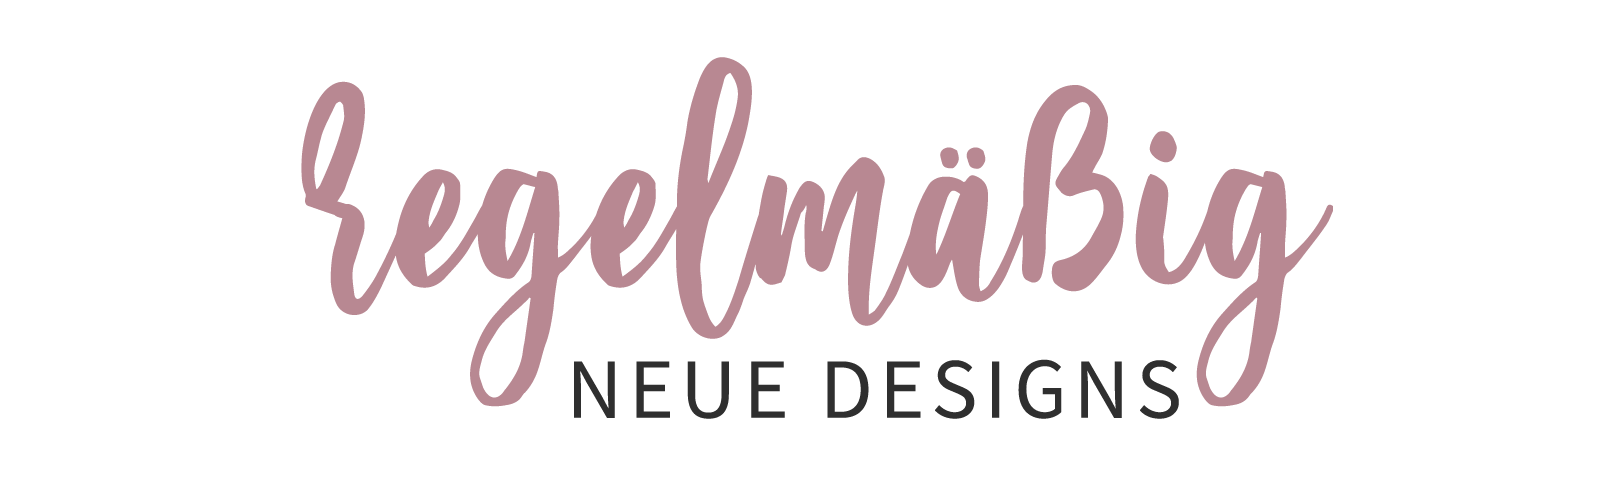 regelmäßig neue Designs